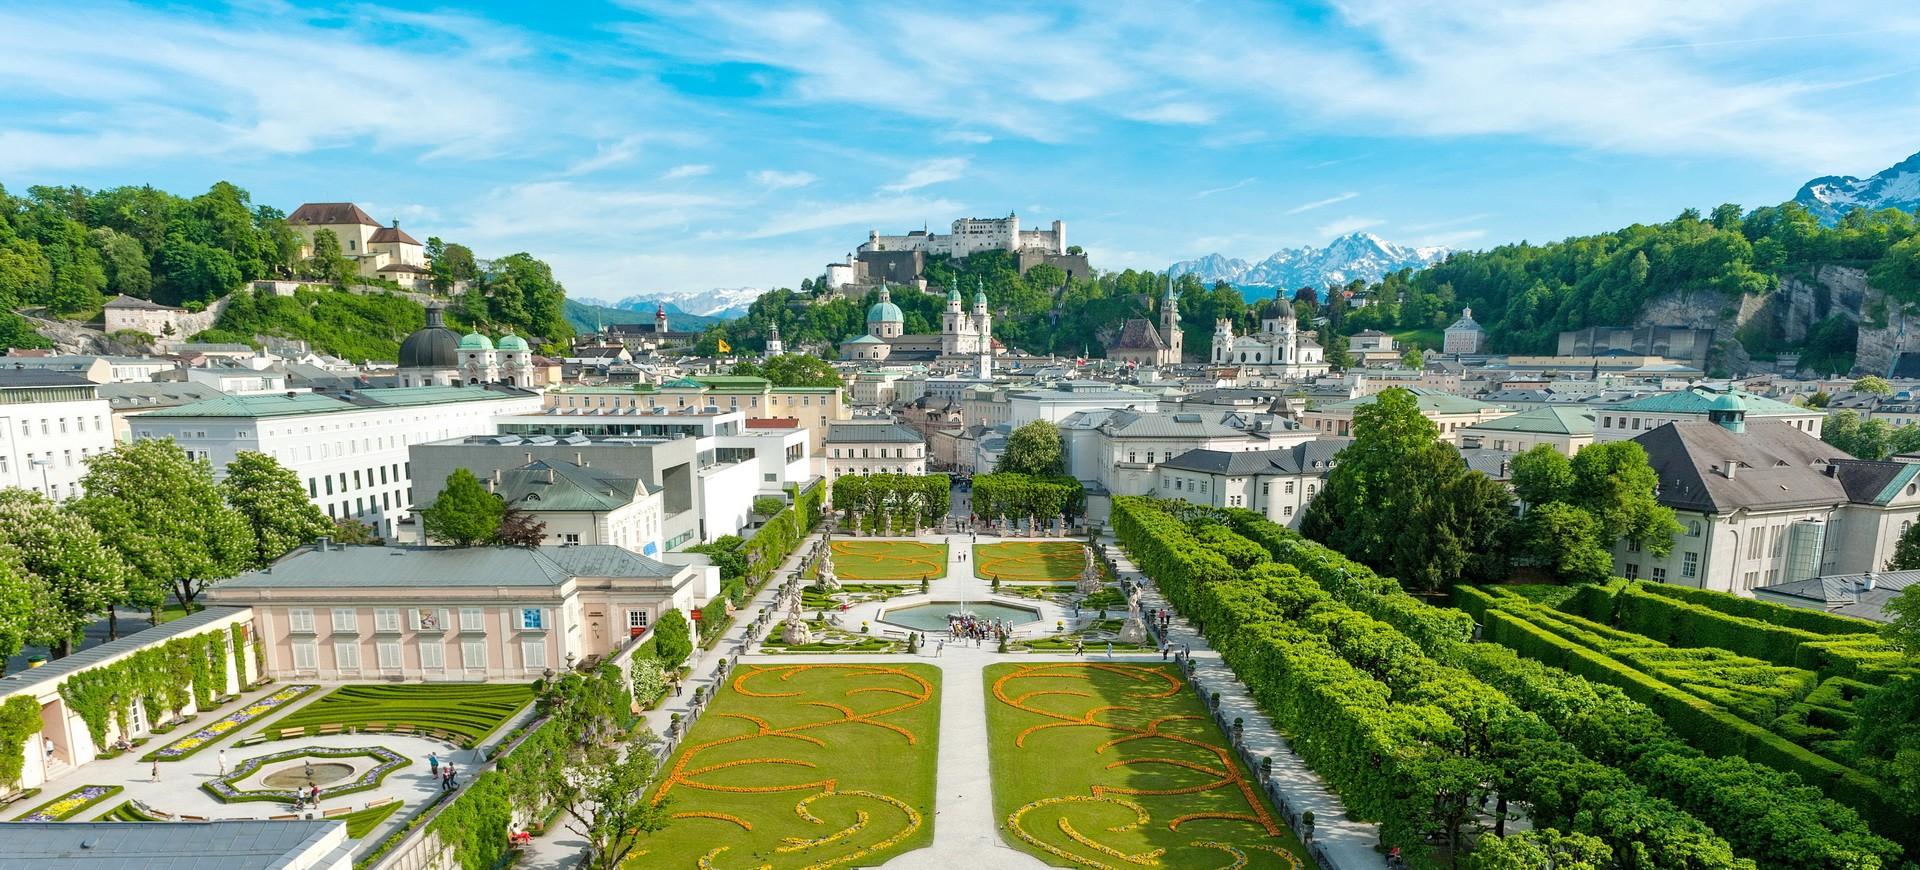 Jardins Mirabell et la Forteresse de Hohensalzburg à Salzbourg